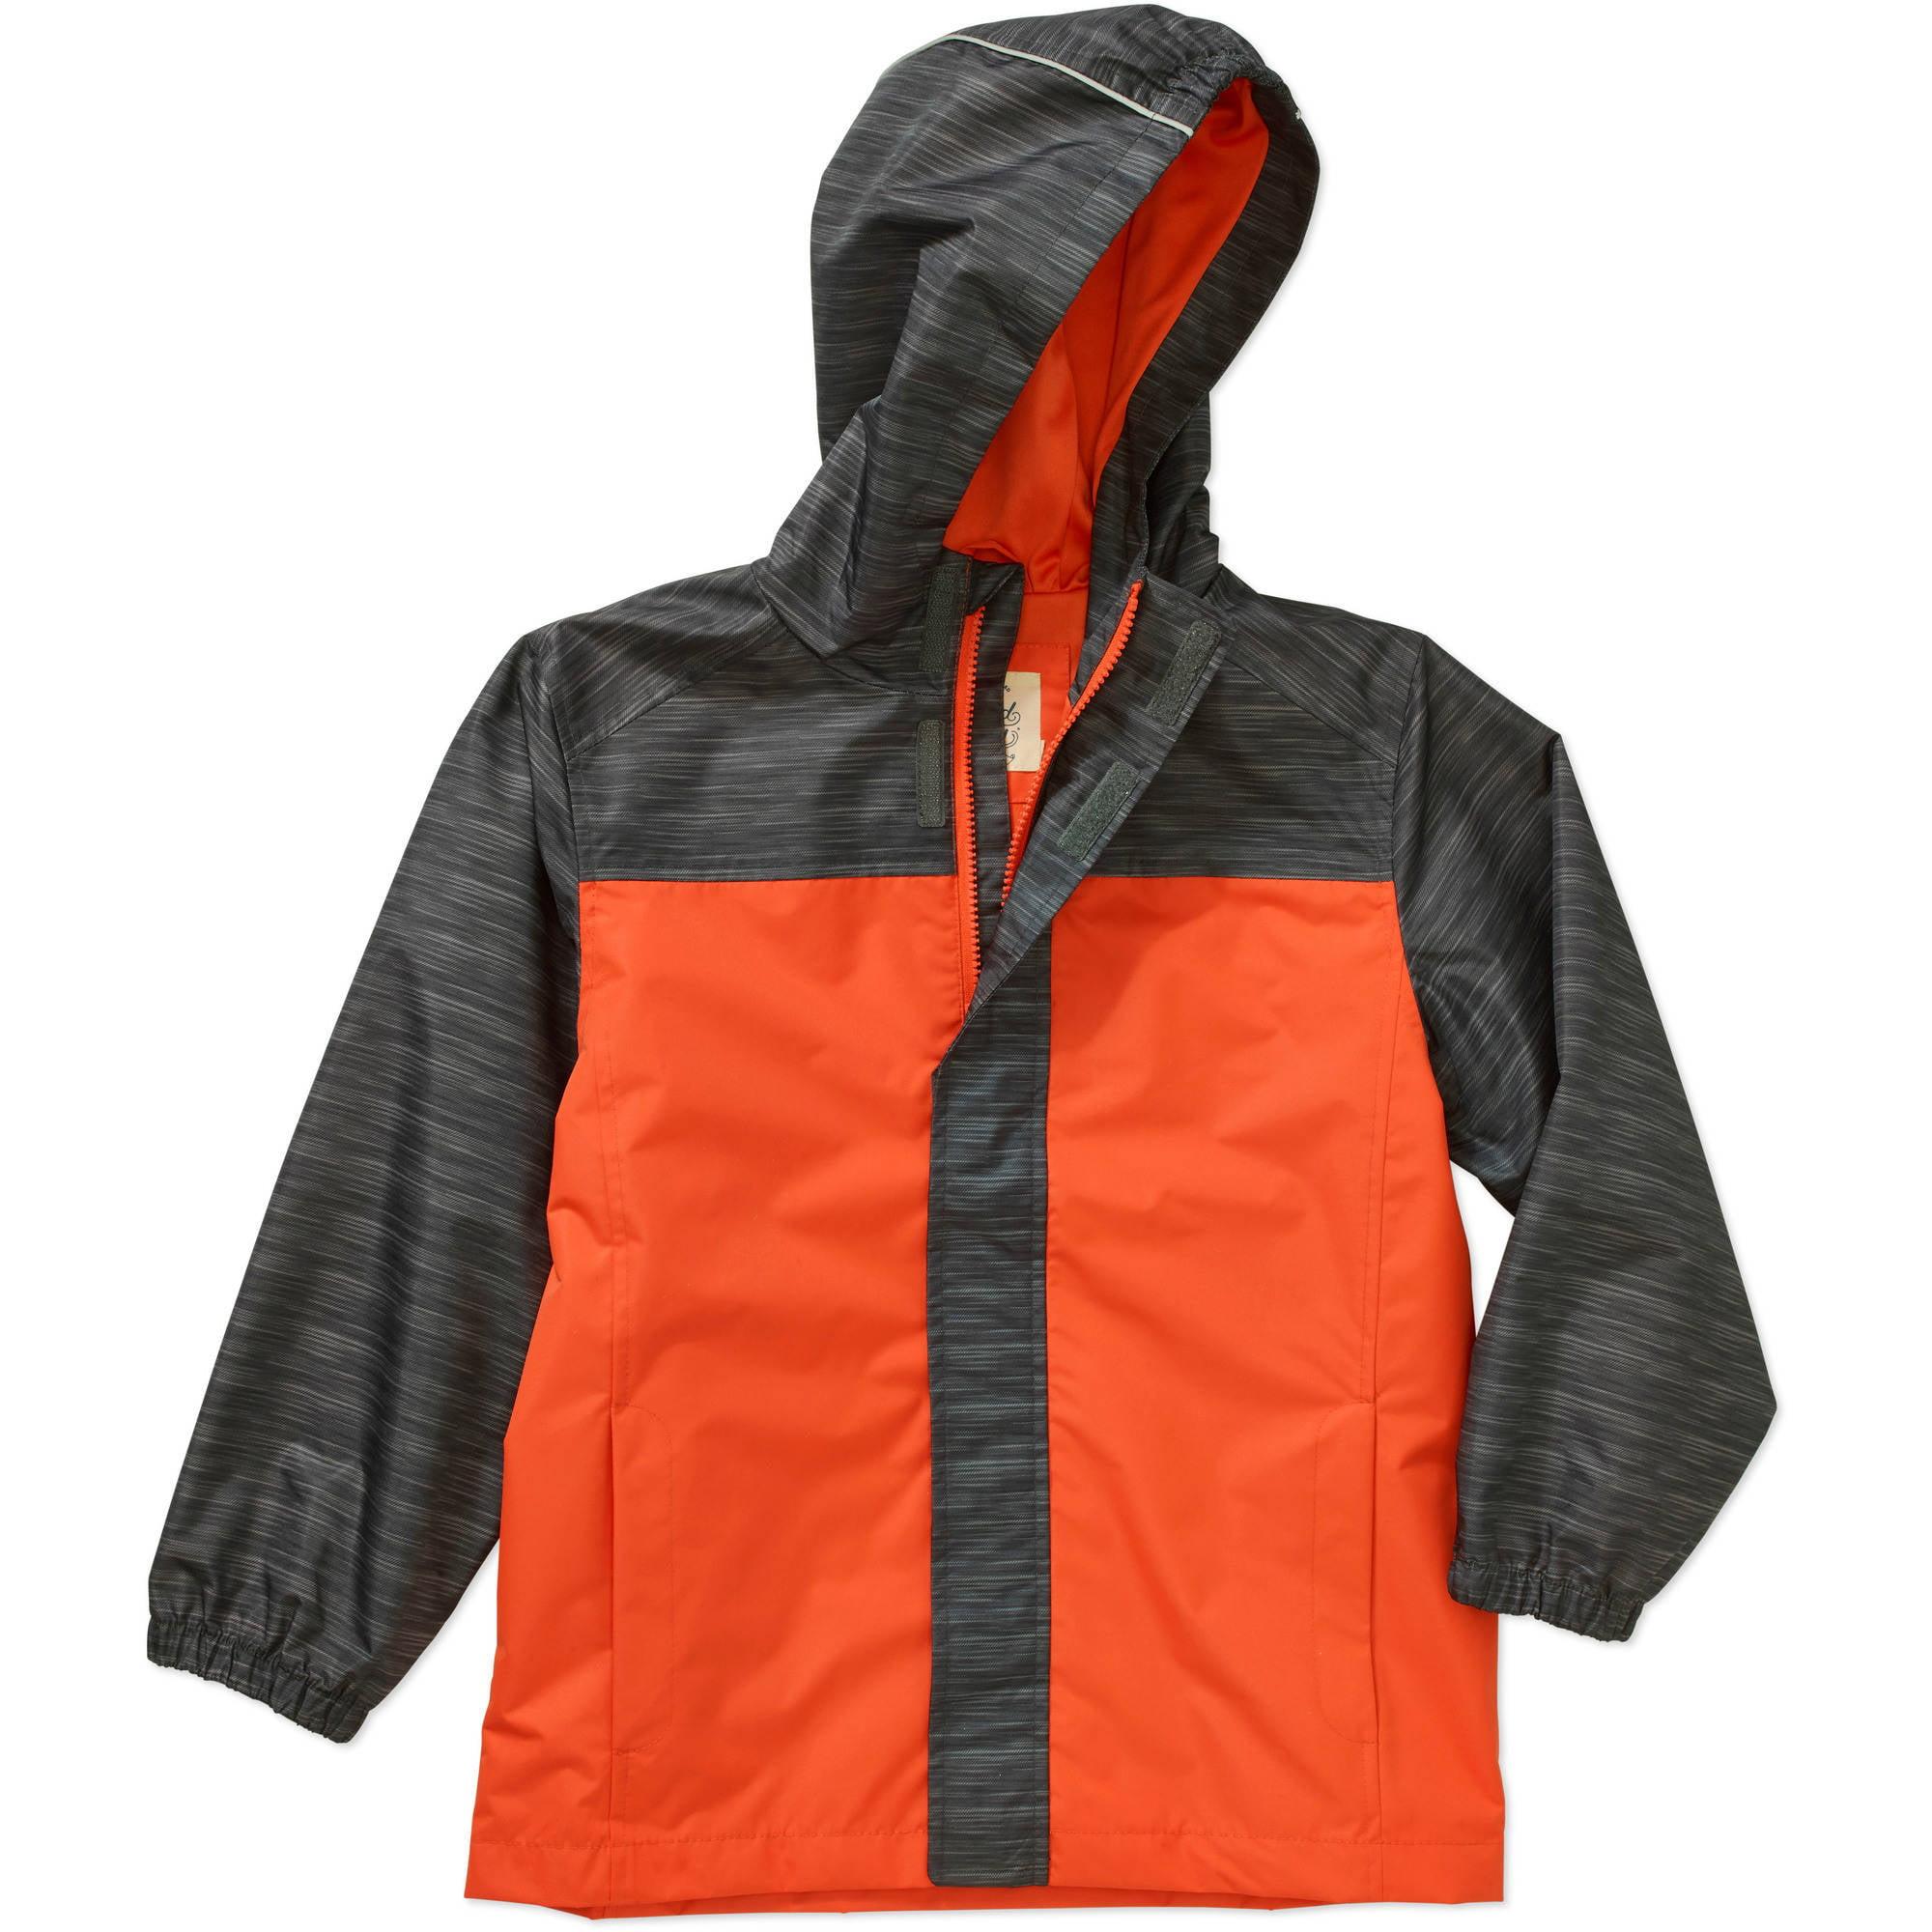 505c196a4c41 Faded Glory - Boys Rain Jacket - Walmart.com